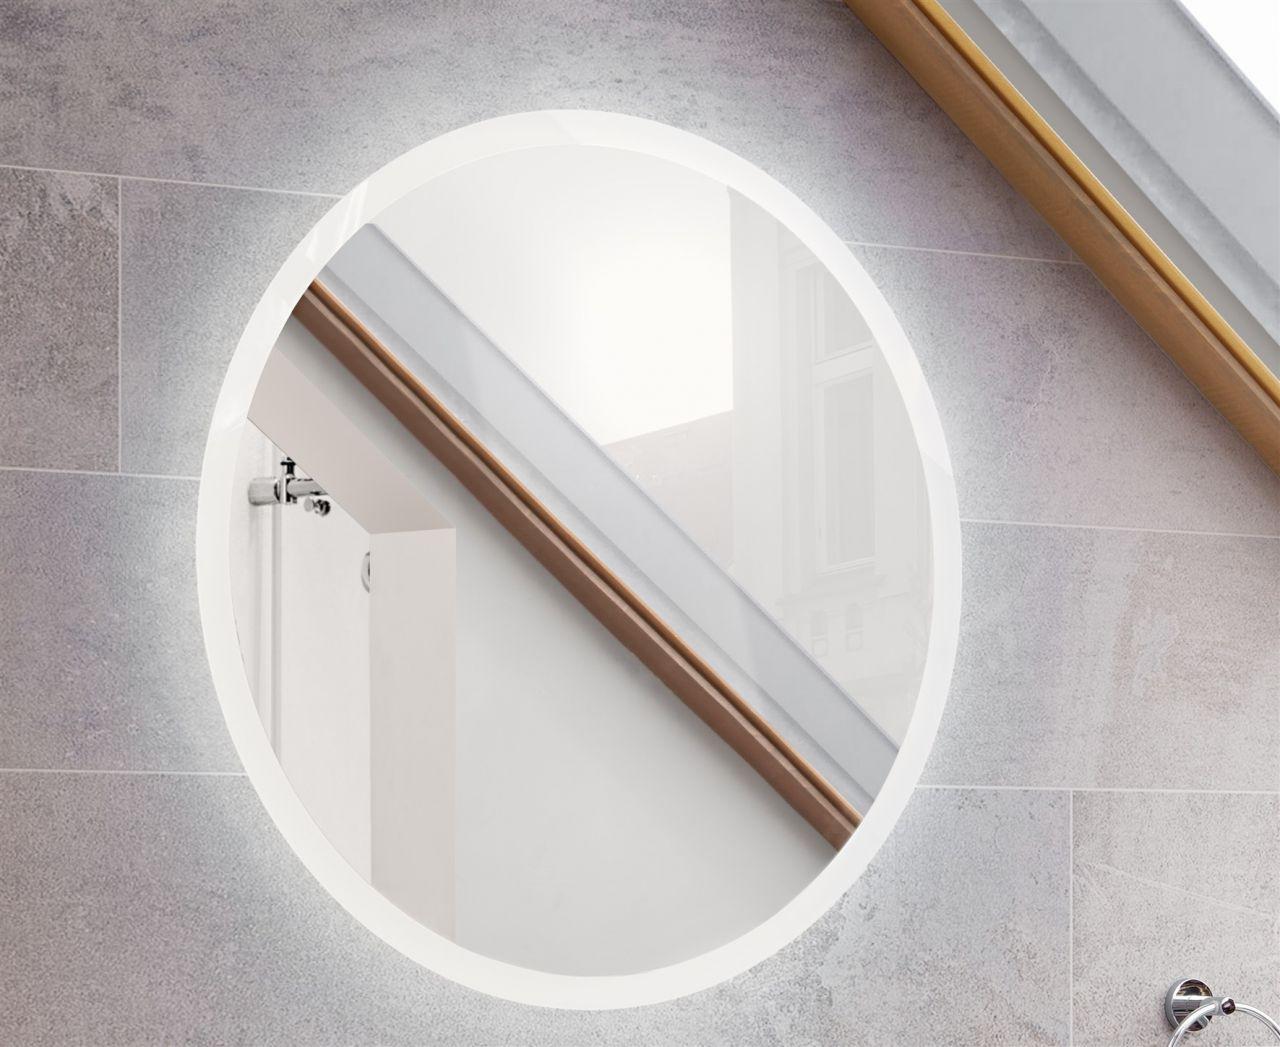 Badezimmer Spiegel Sorbi Inklusive Led Beleuchtung